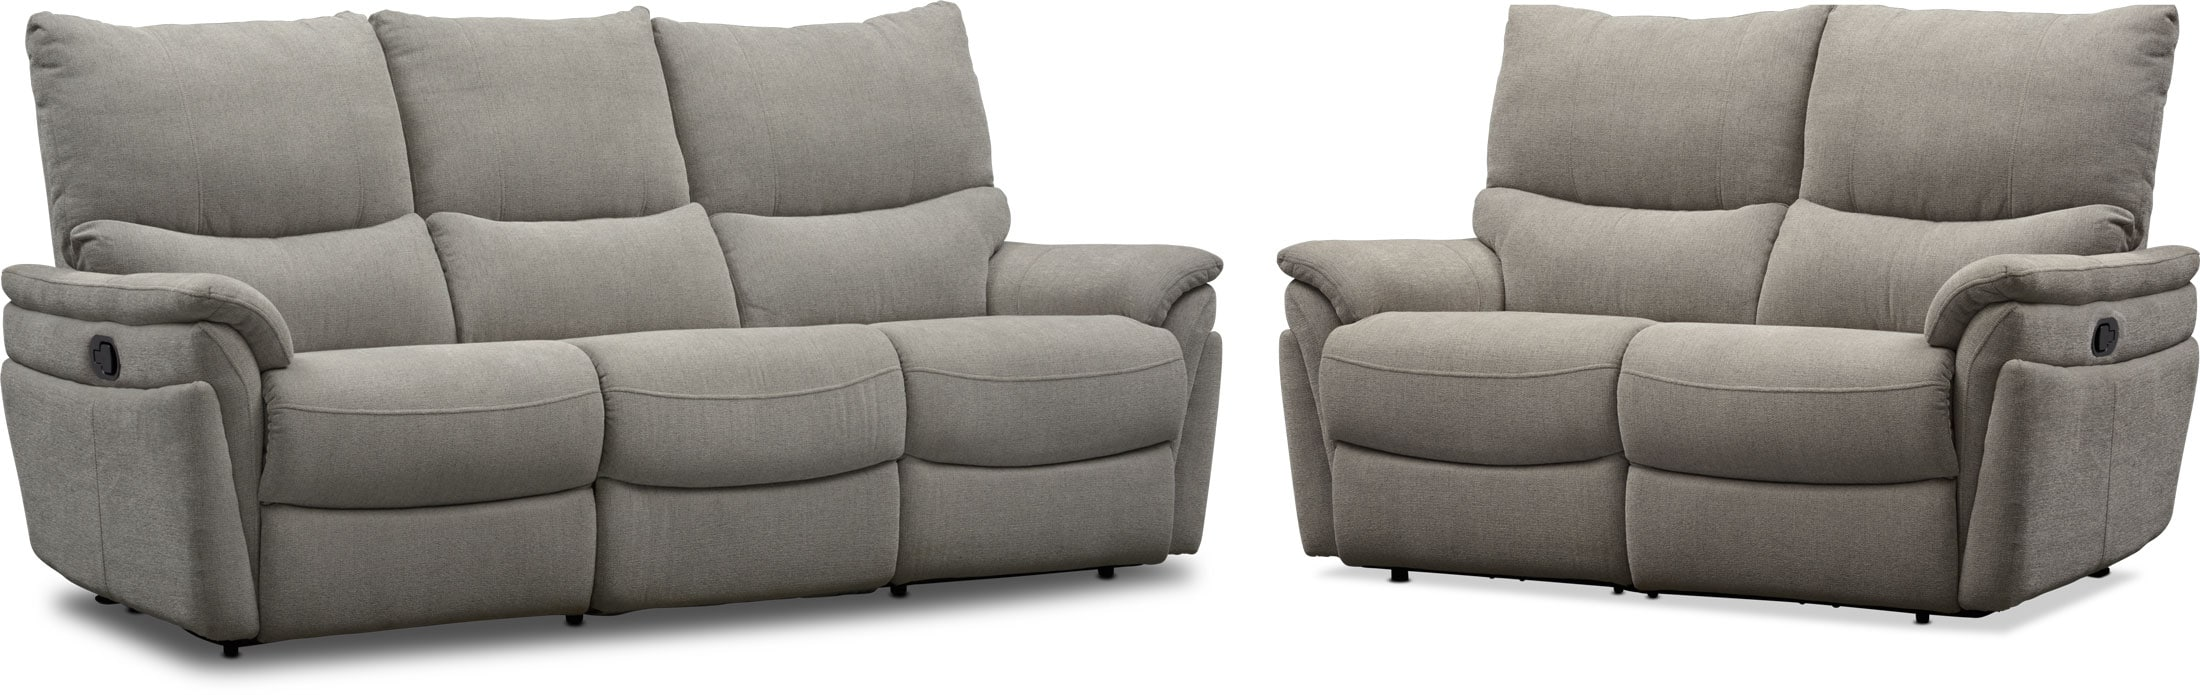 Living Room Furniture - Maddox Manual Reclining Sofa and Loveseat